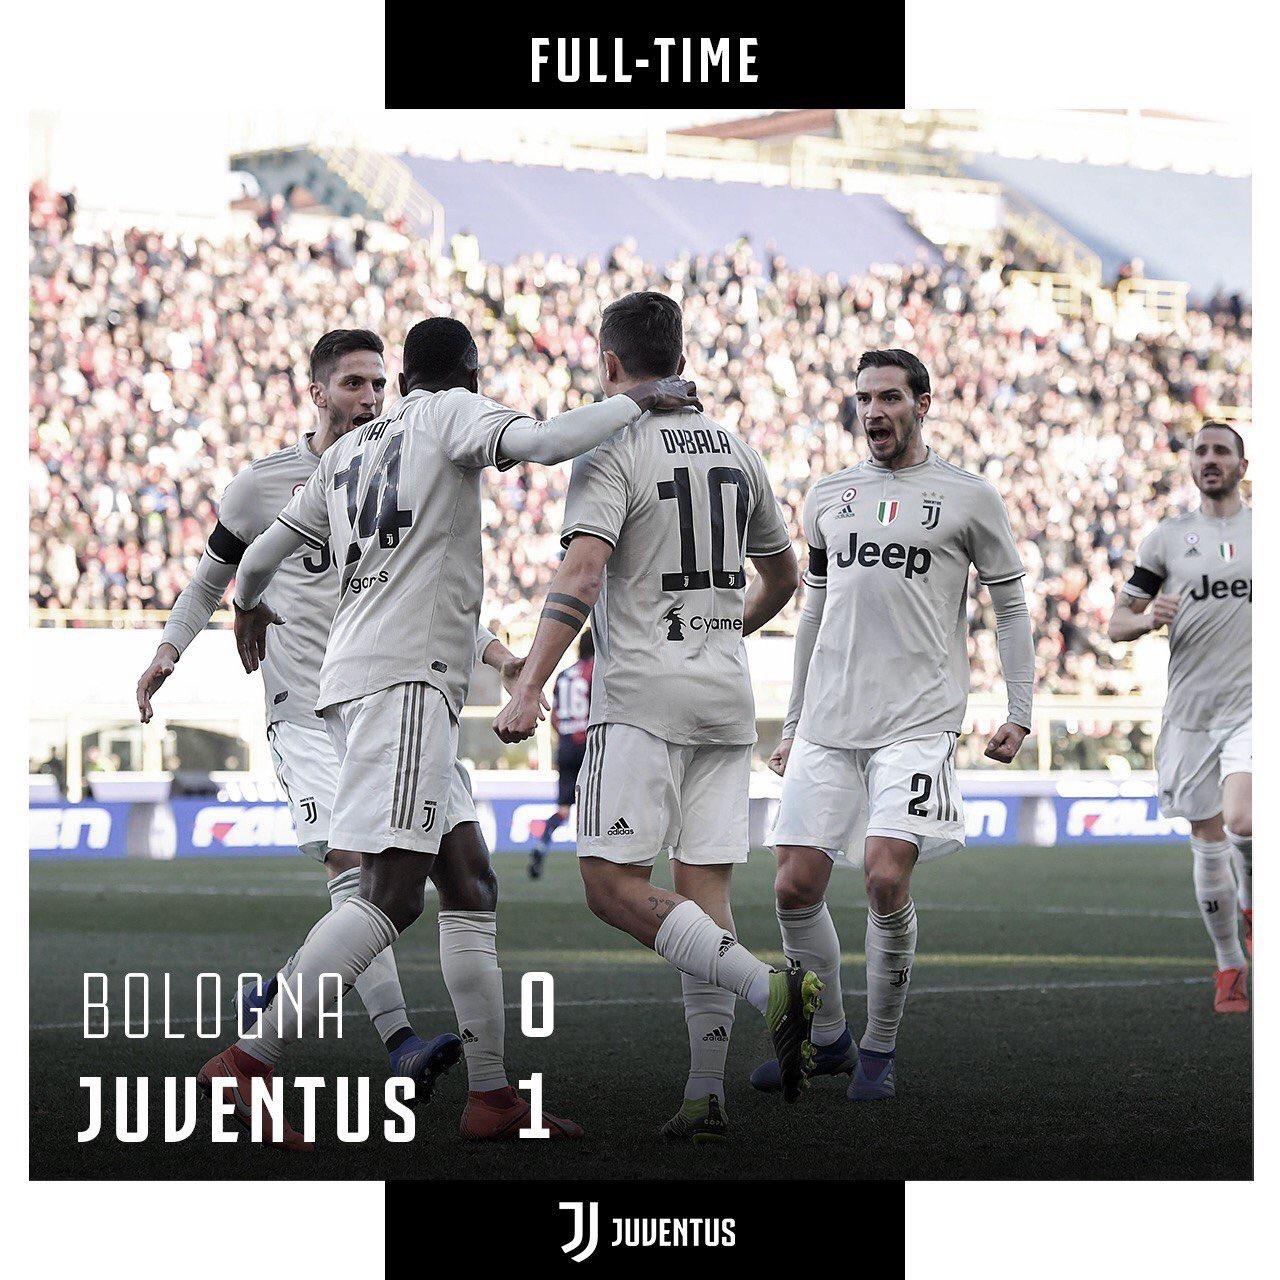 Serie A- La Juventus non brilla ma vince, Dybala giustizia un buon Bologna (0-1)